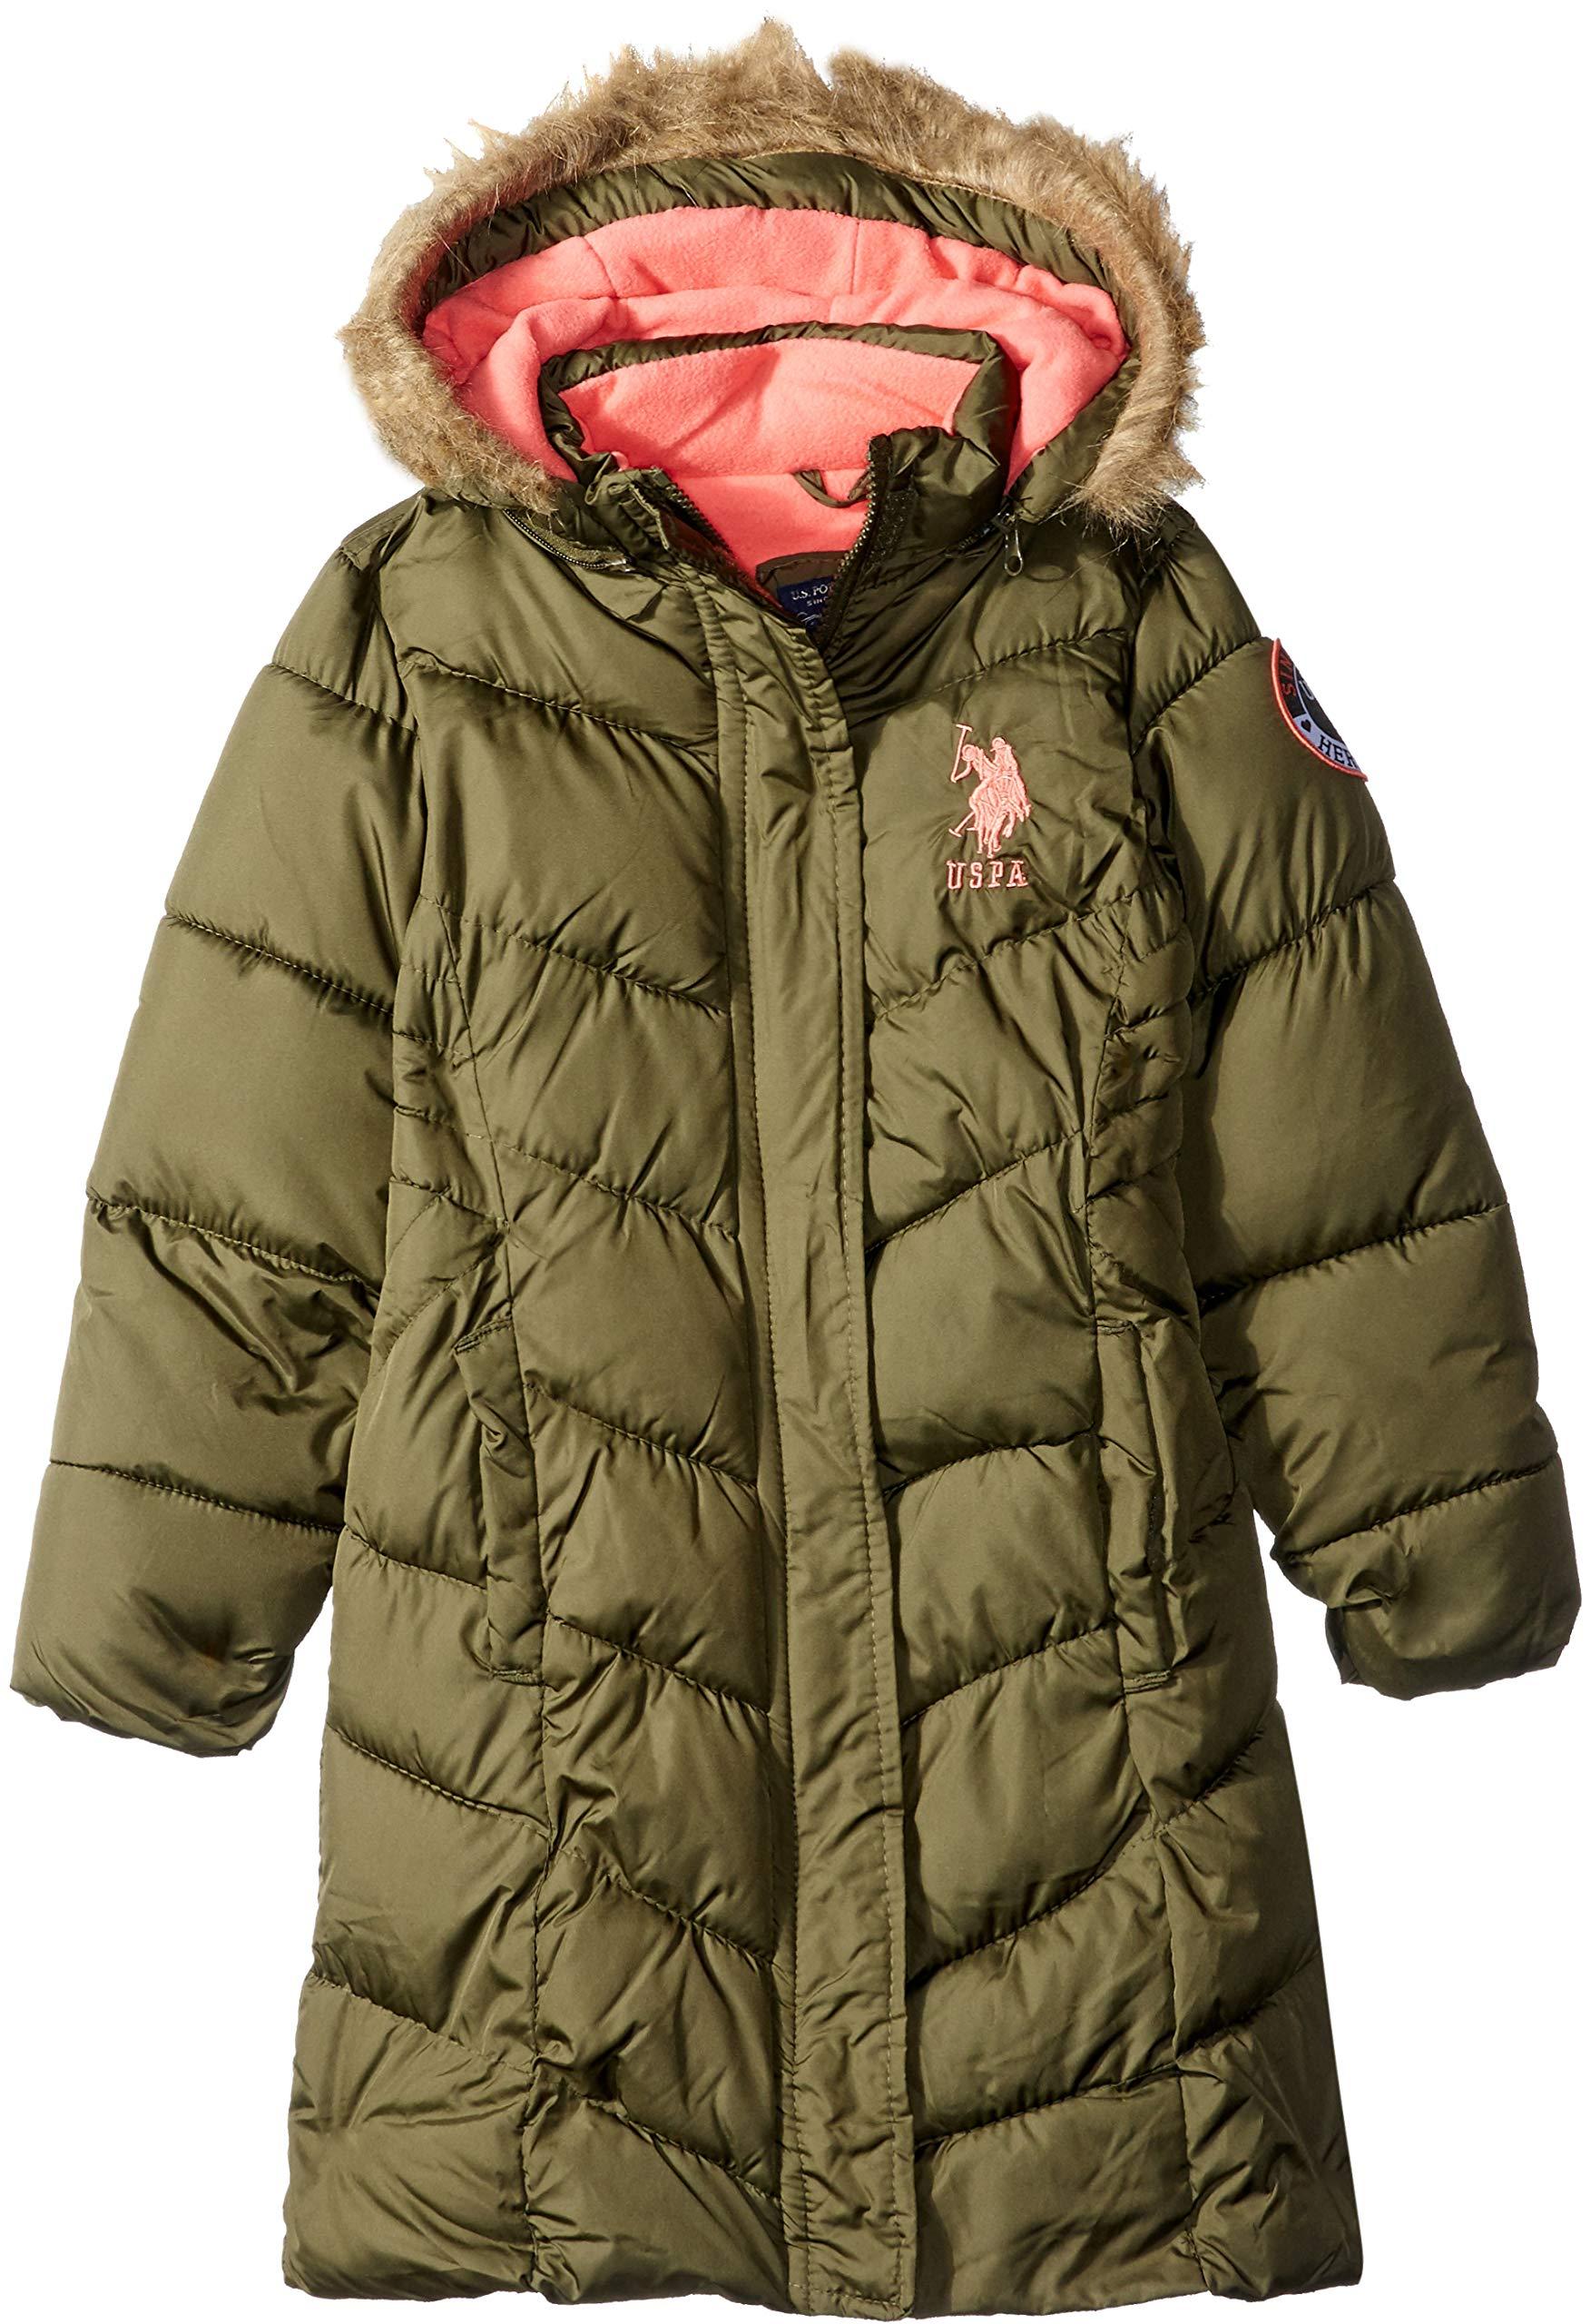 US Polo Association Girls' Big Long Bubble Jacket, Olive, 10/12 by U.S. Polo Assn. (Image #1)